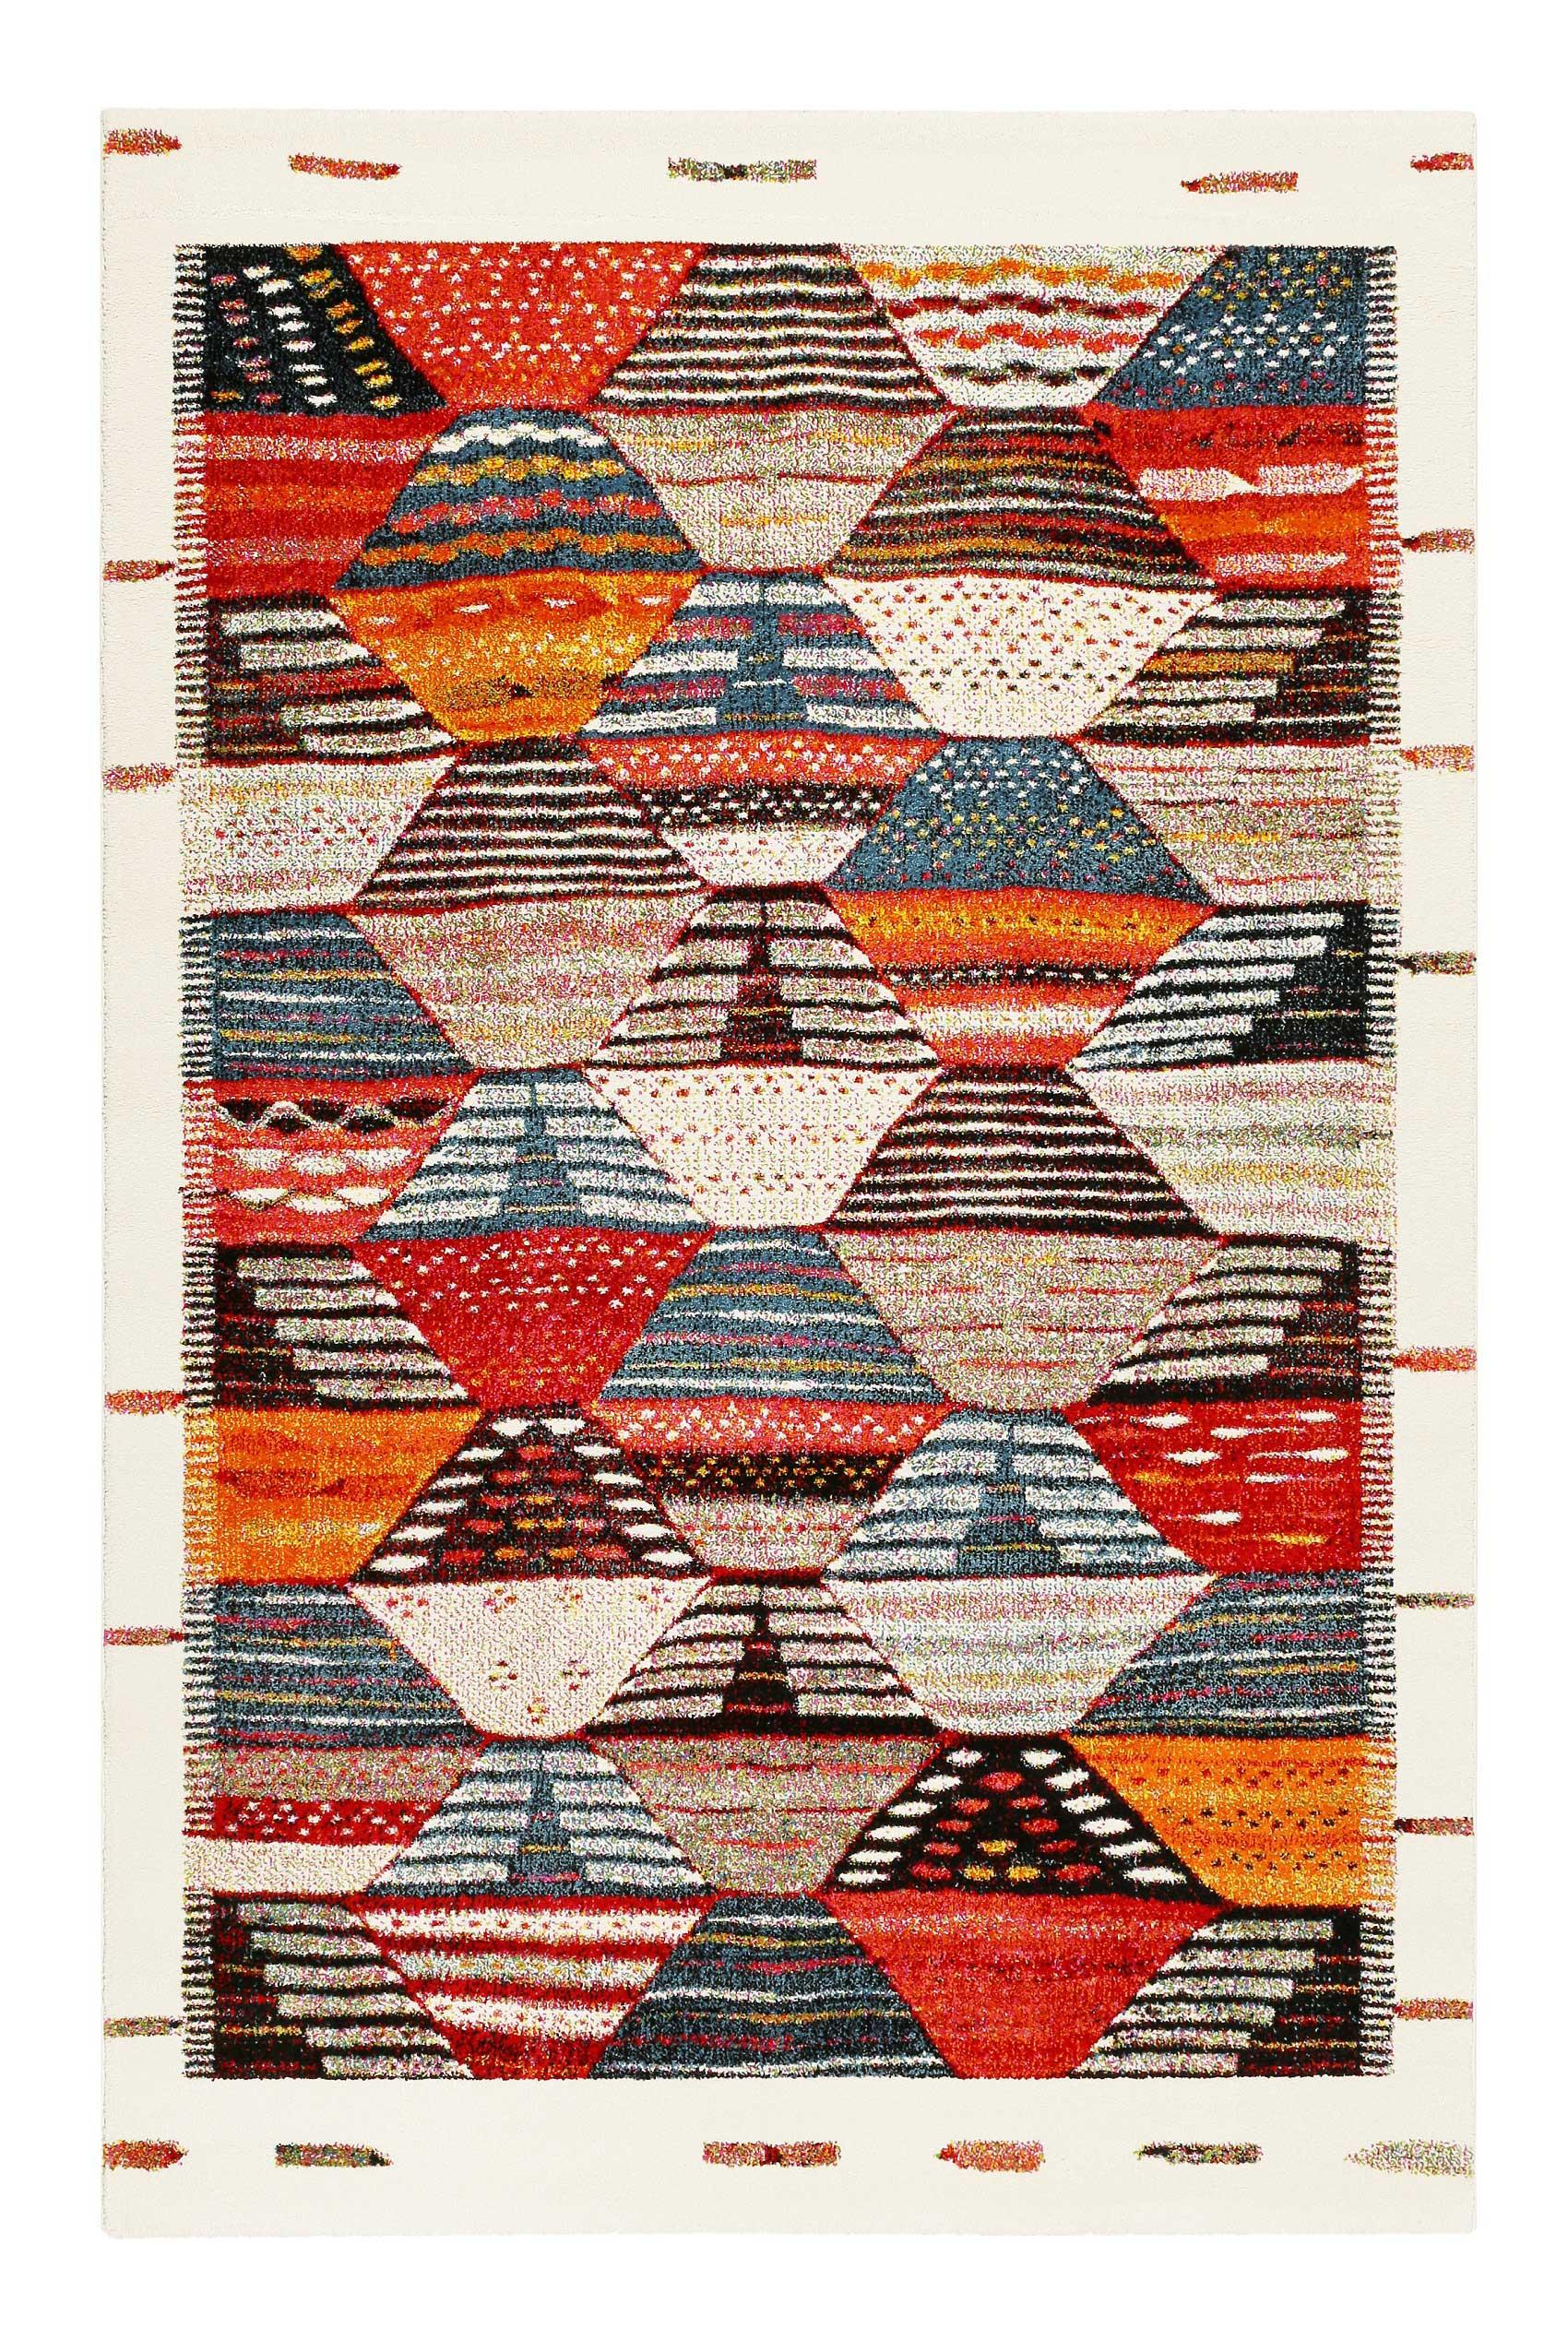 Tapis inspiration berbère multicolore pour salon, chambre 170x120